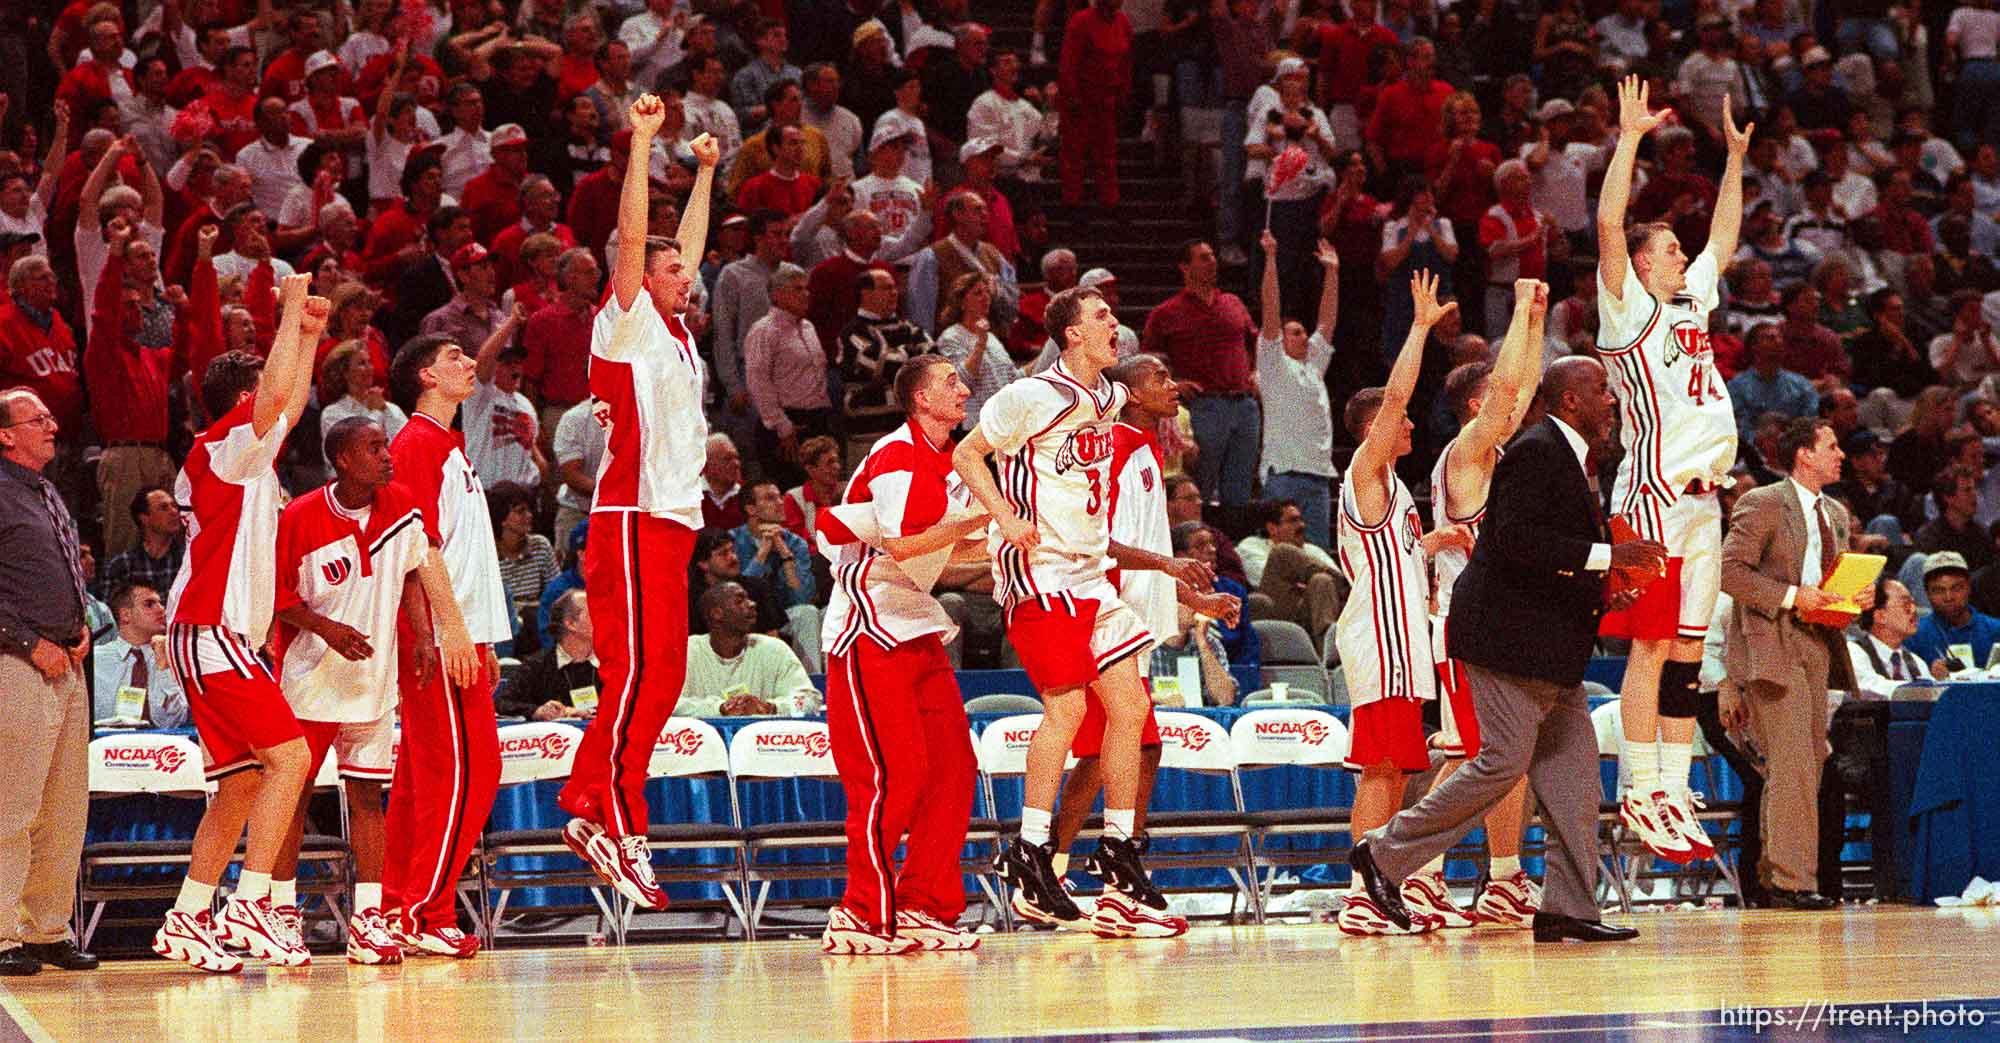 Team celebrates win at Utah vs Stanford, NCAA Tournament.